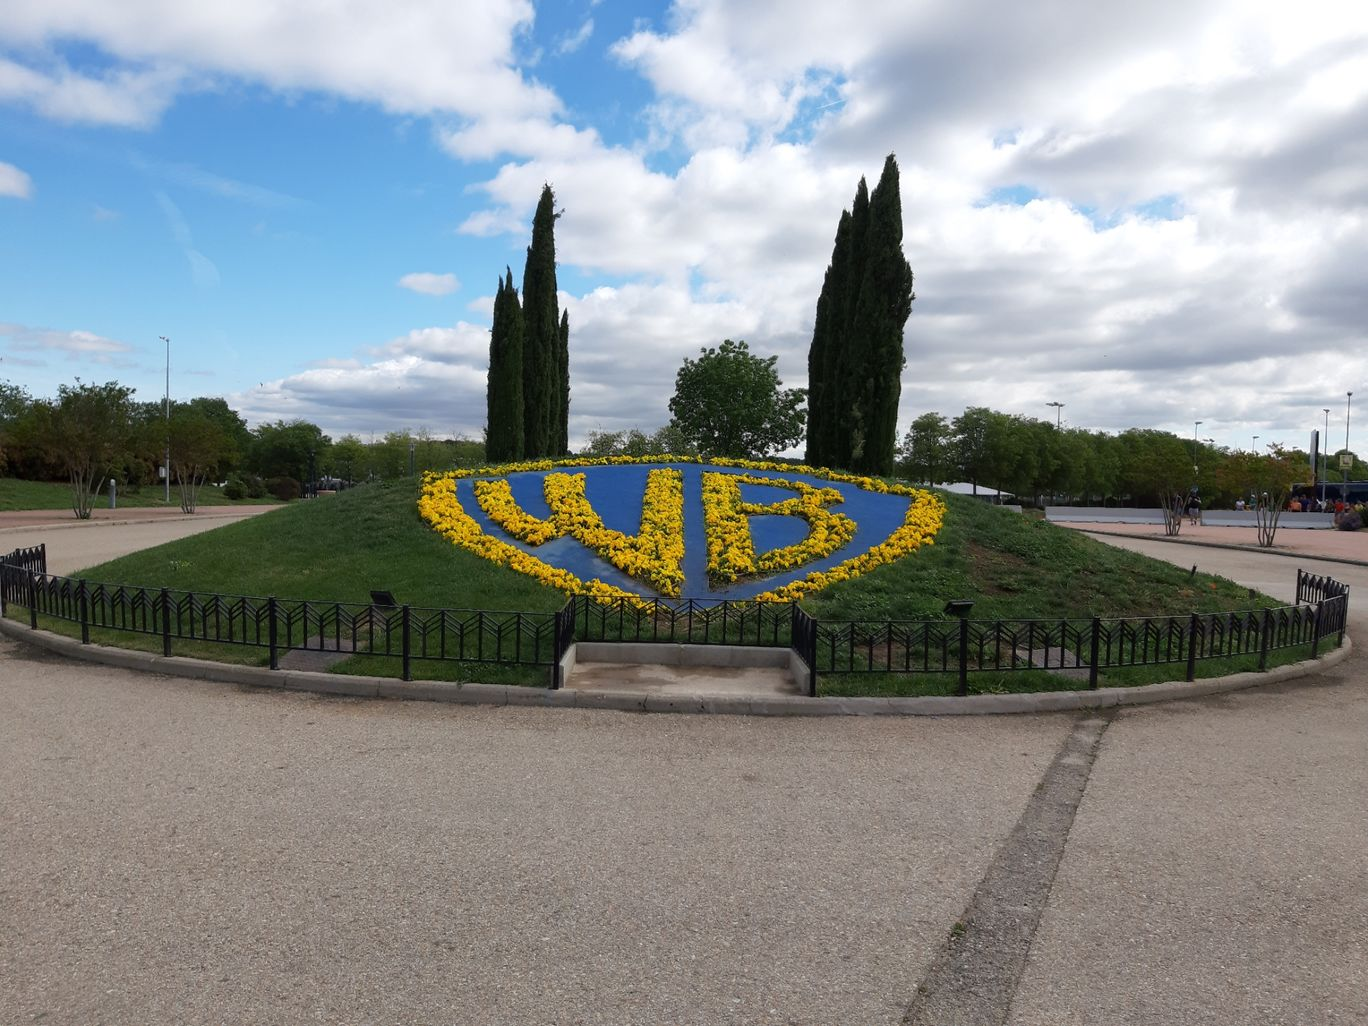 Photo of Parque Warner Madrid By Aishwarya Nathawat